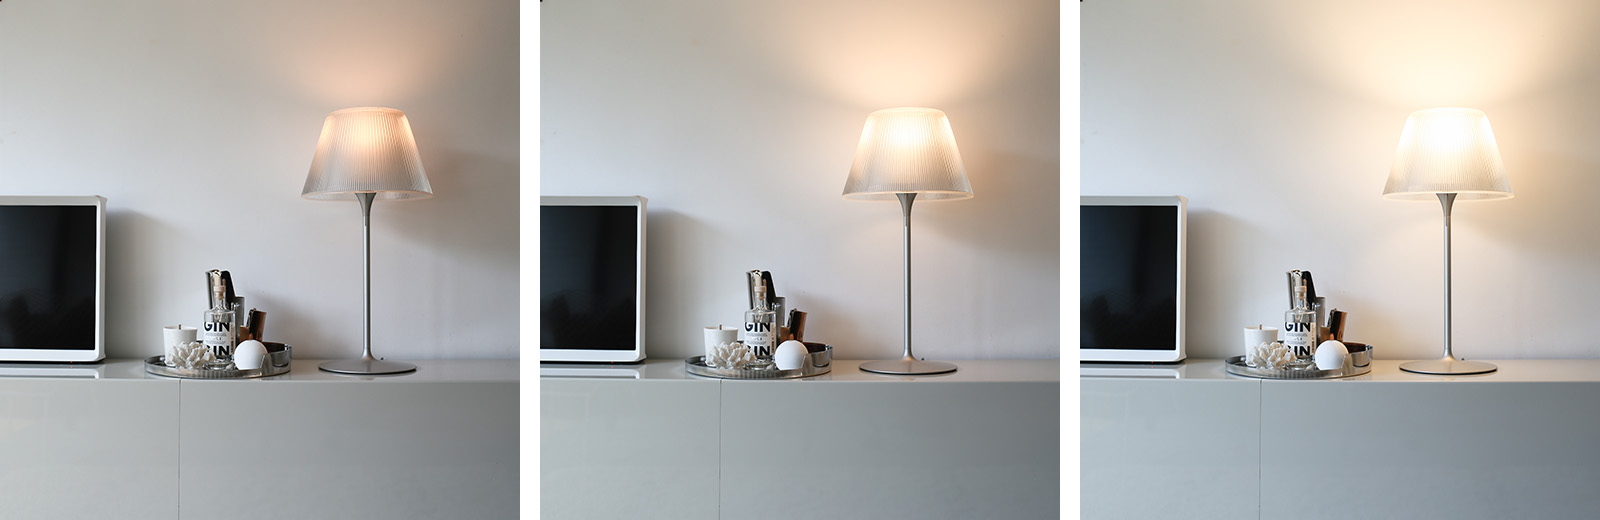 Phillips Scenswitch bulbs   Design Hunter